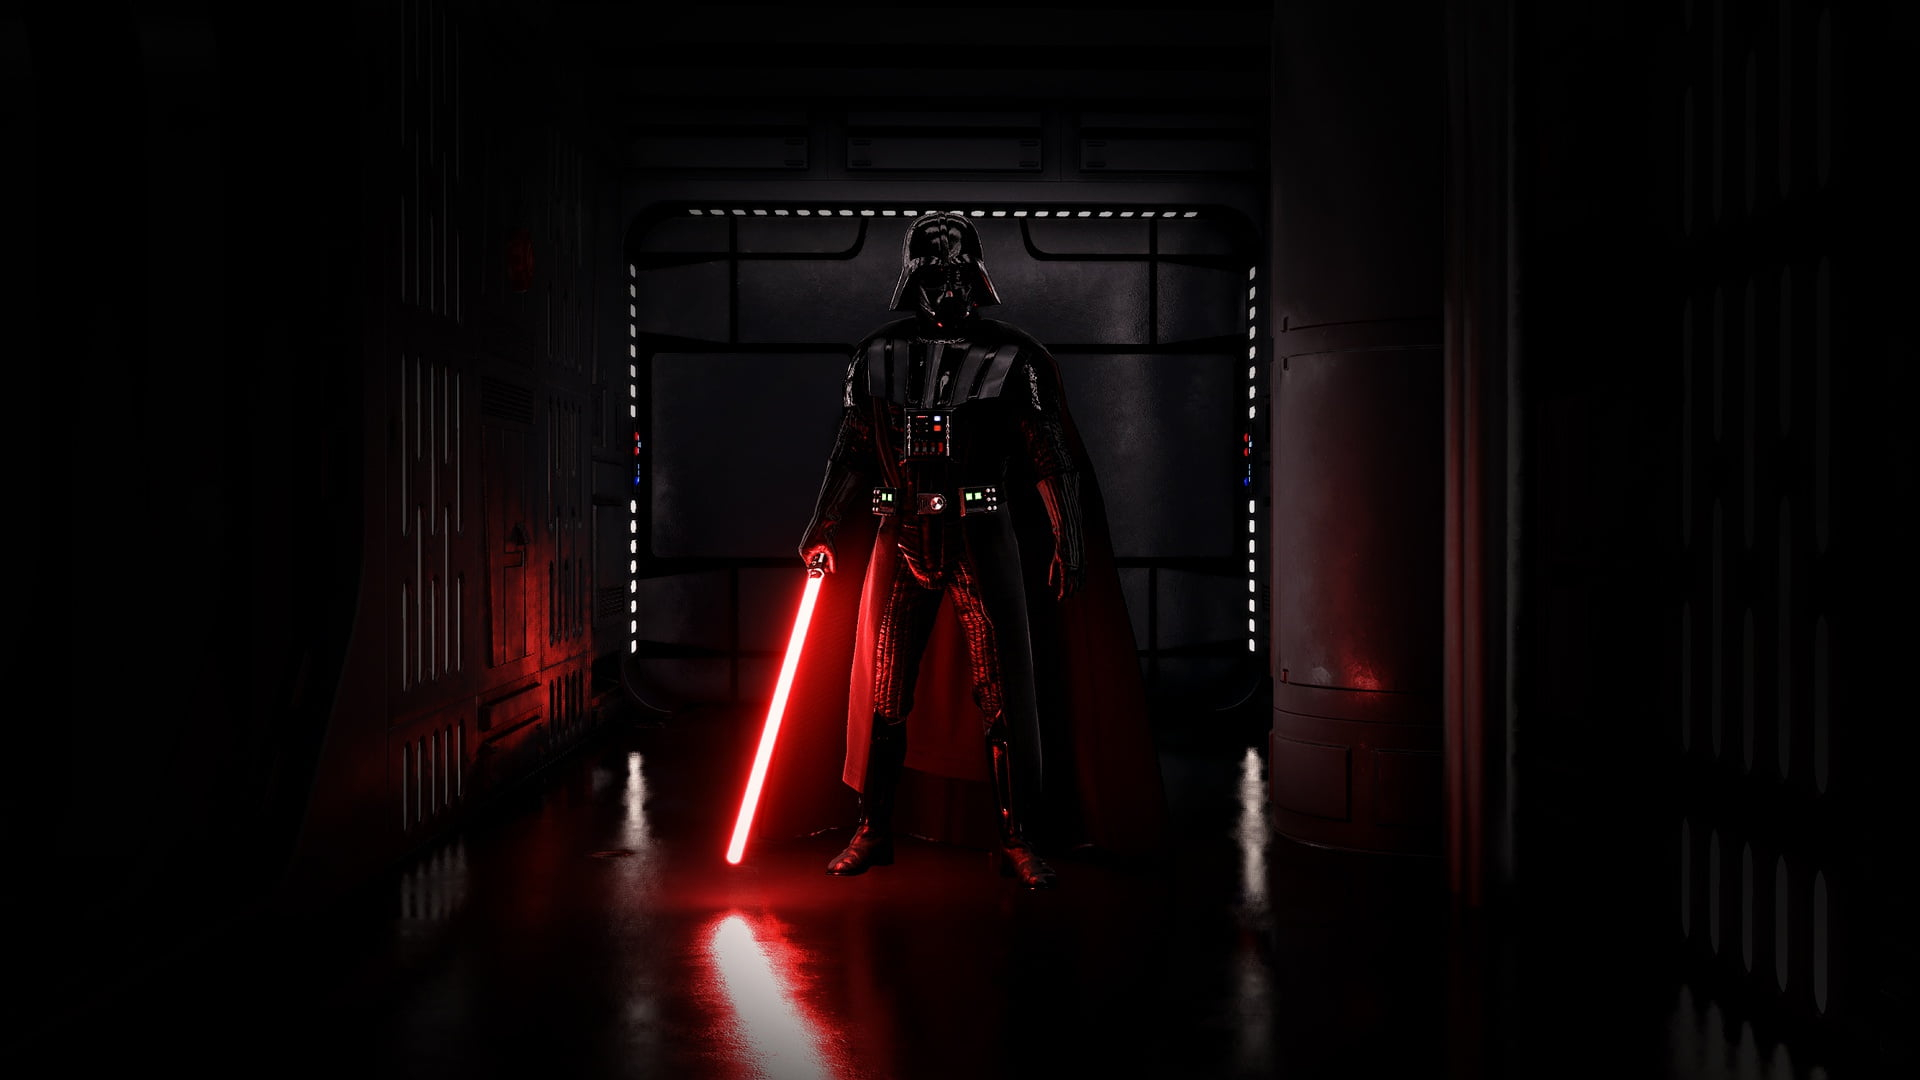 Dark Wallpaper Star Wars Darth Vader Digital Wallpaper Sith Dark Lightsaber Wallpaper For You The Best Wallpaper For Desktop Mobile